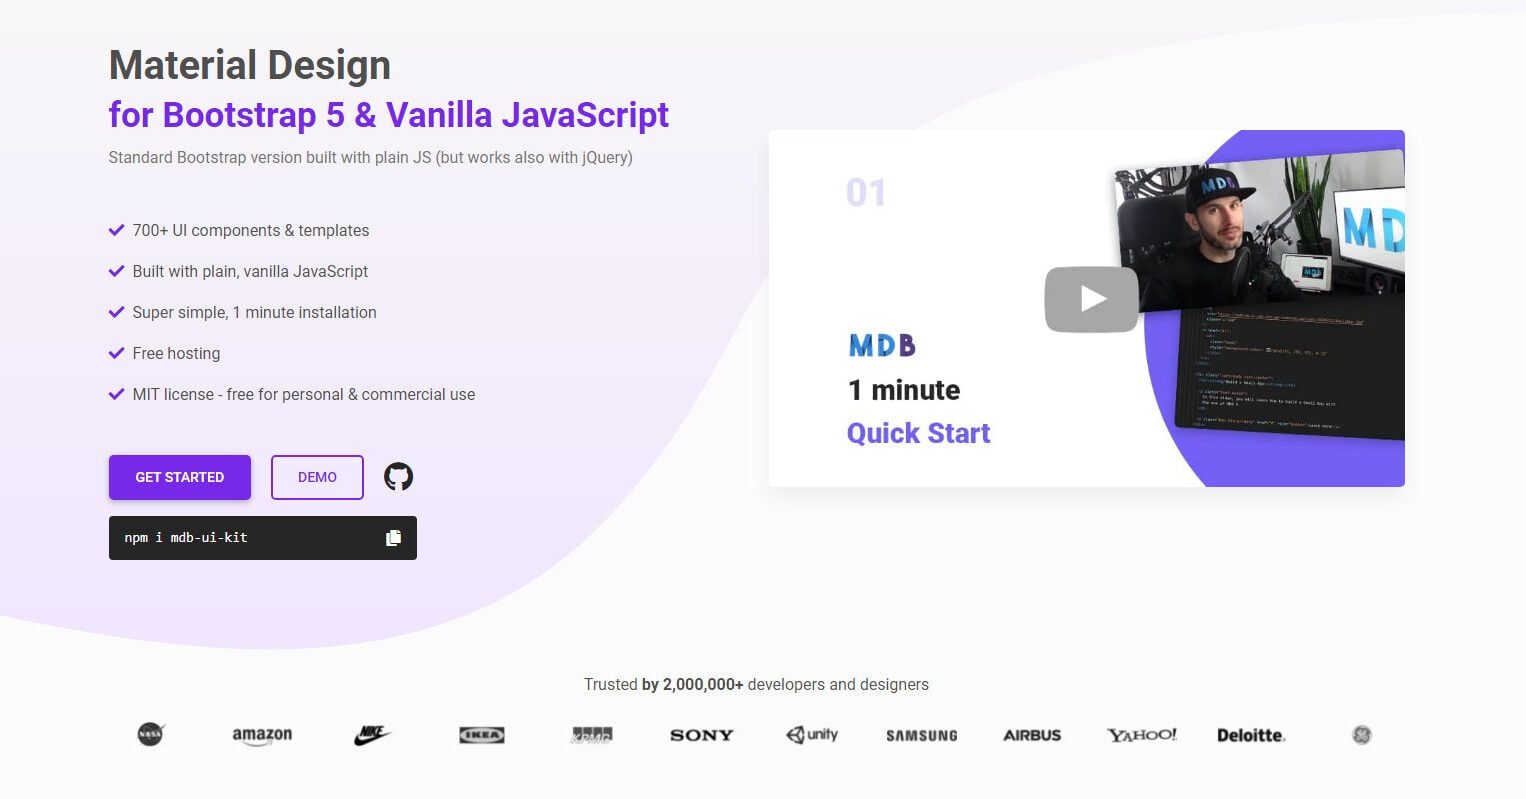 Material Design for Bootstrap 5 & Vanilla JavaScript